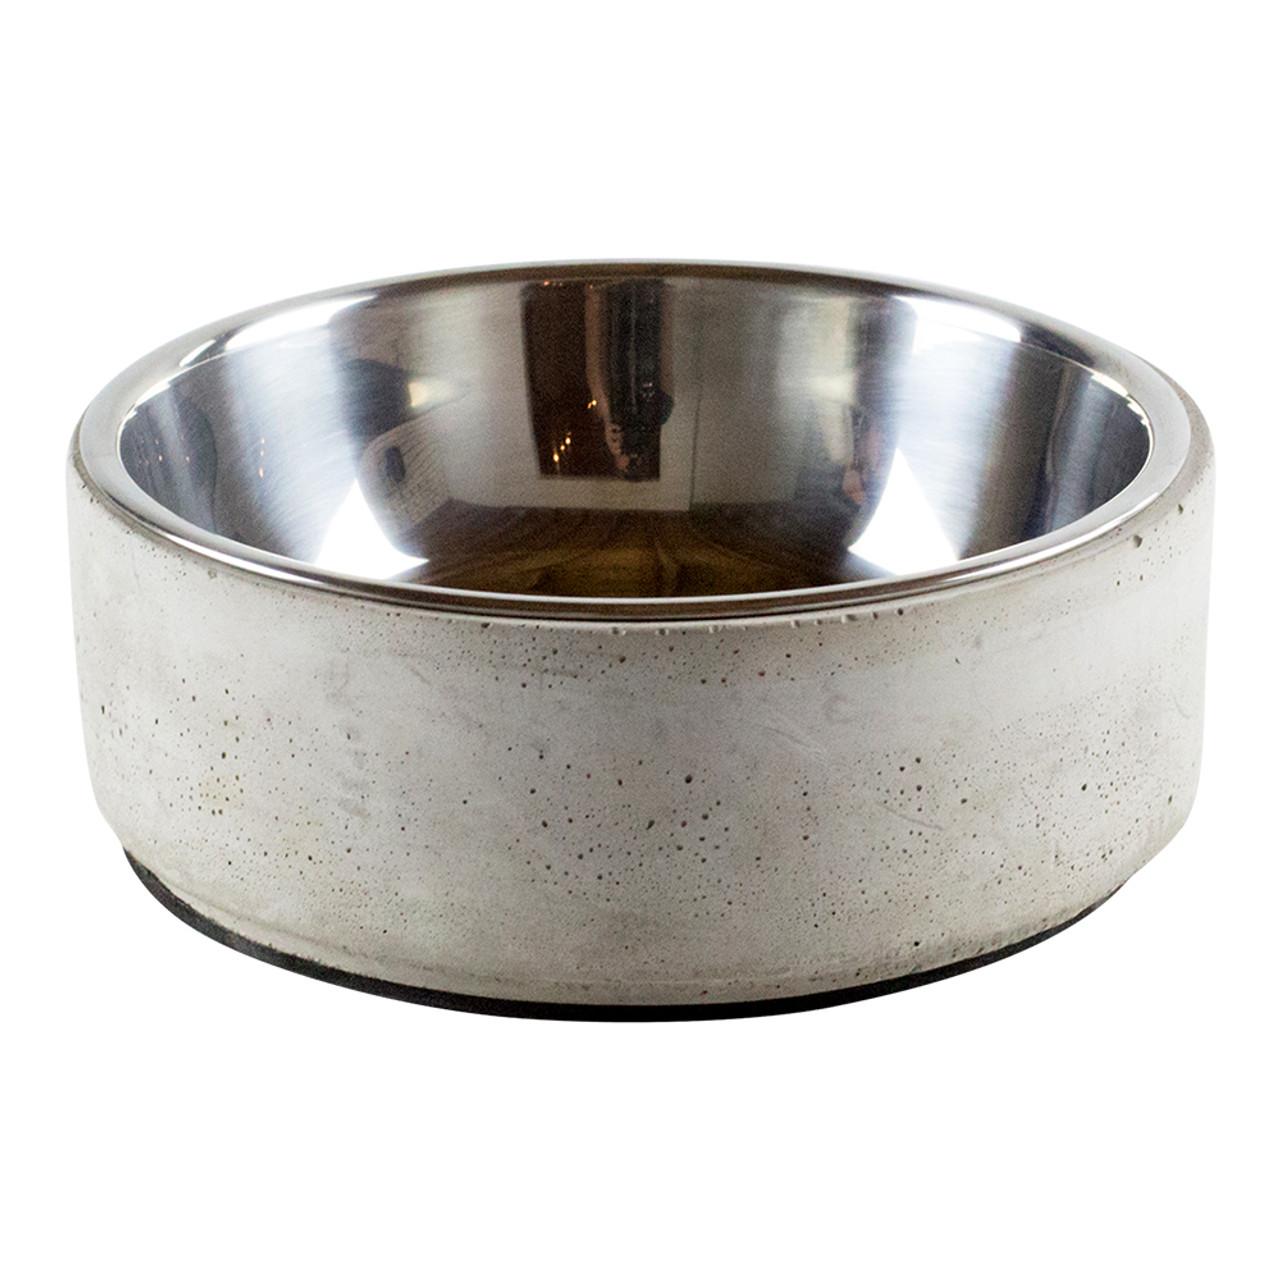 BeOneBreed Concrete Dog Bowl